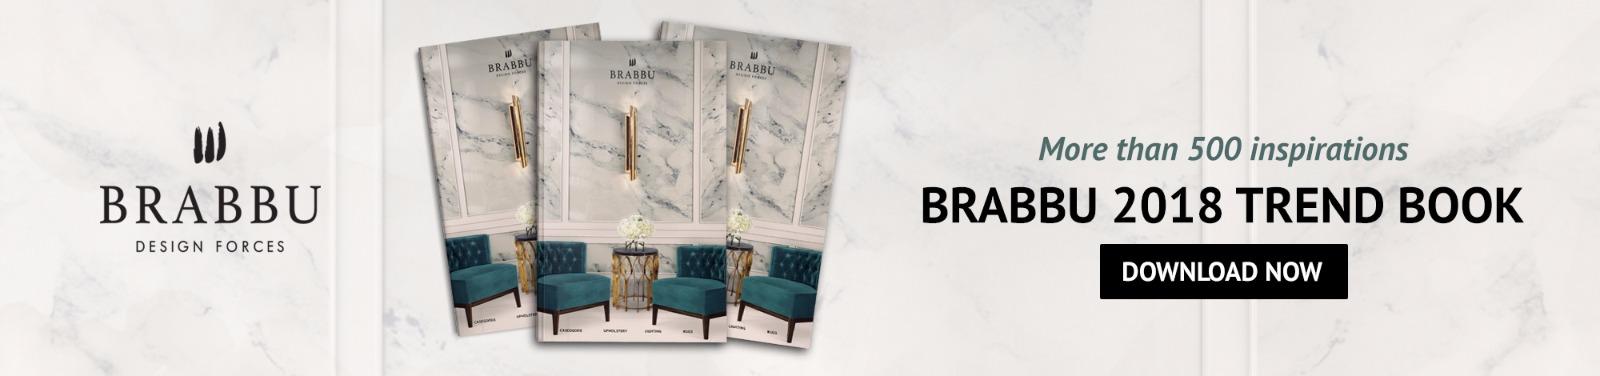 дизайн интерьера Великолепный дизайн интерьера отеля Fairmont вместе с BRABBU banner ebook